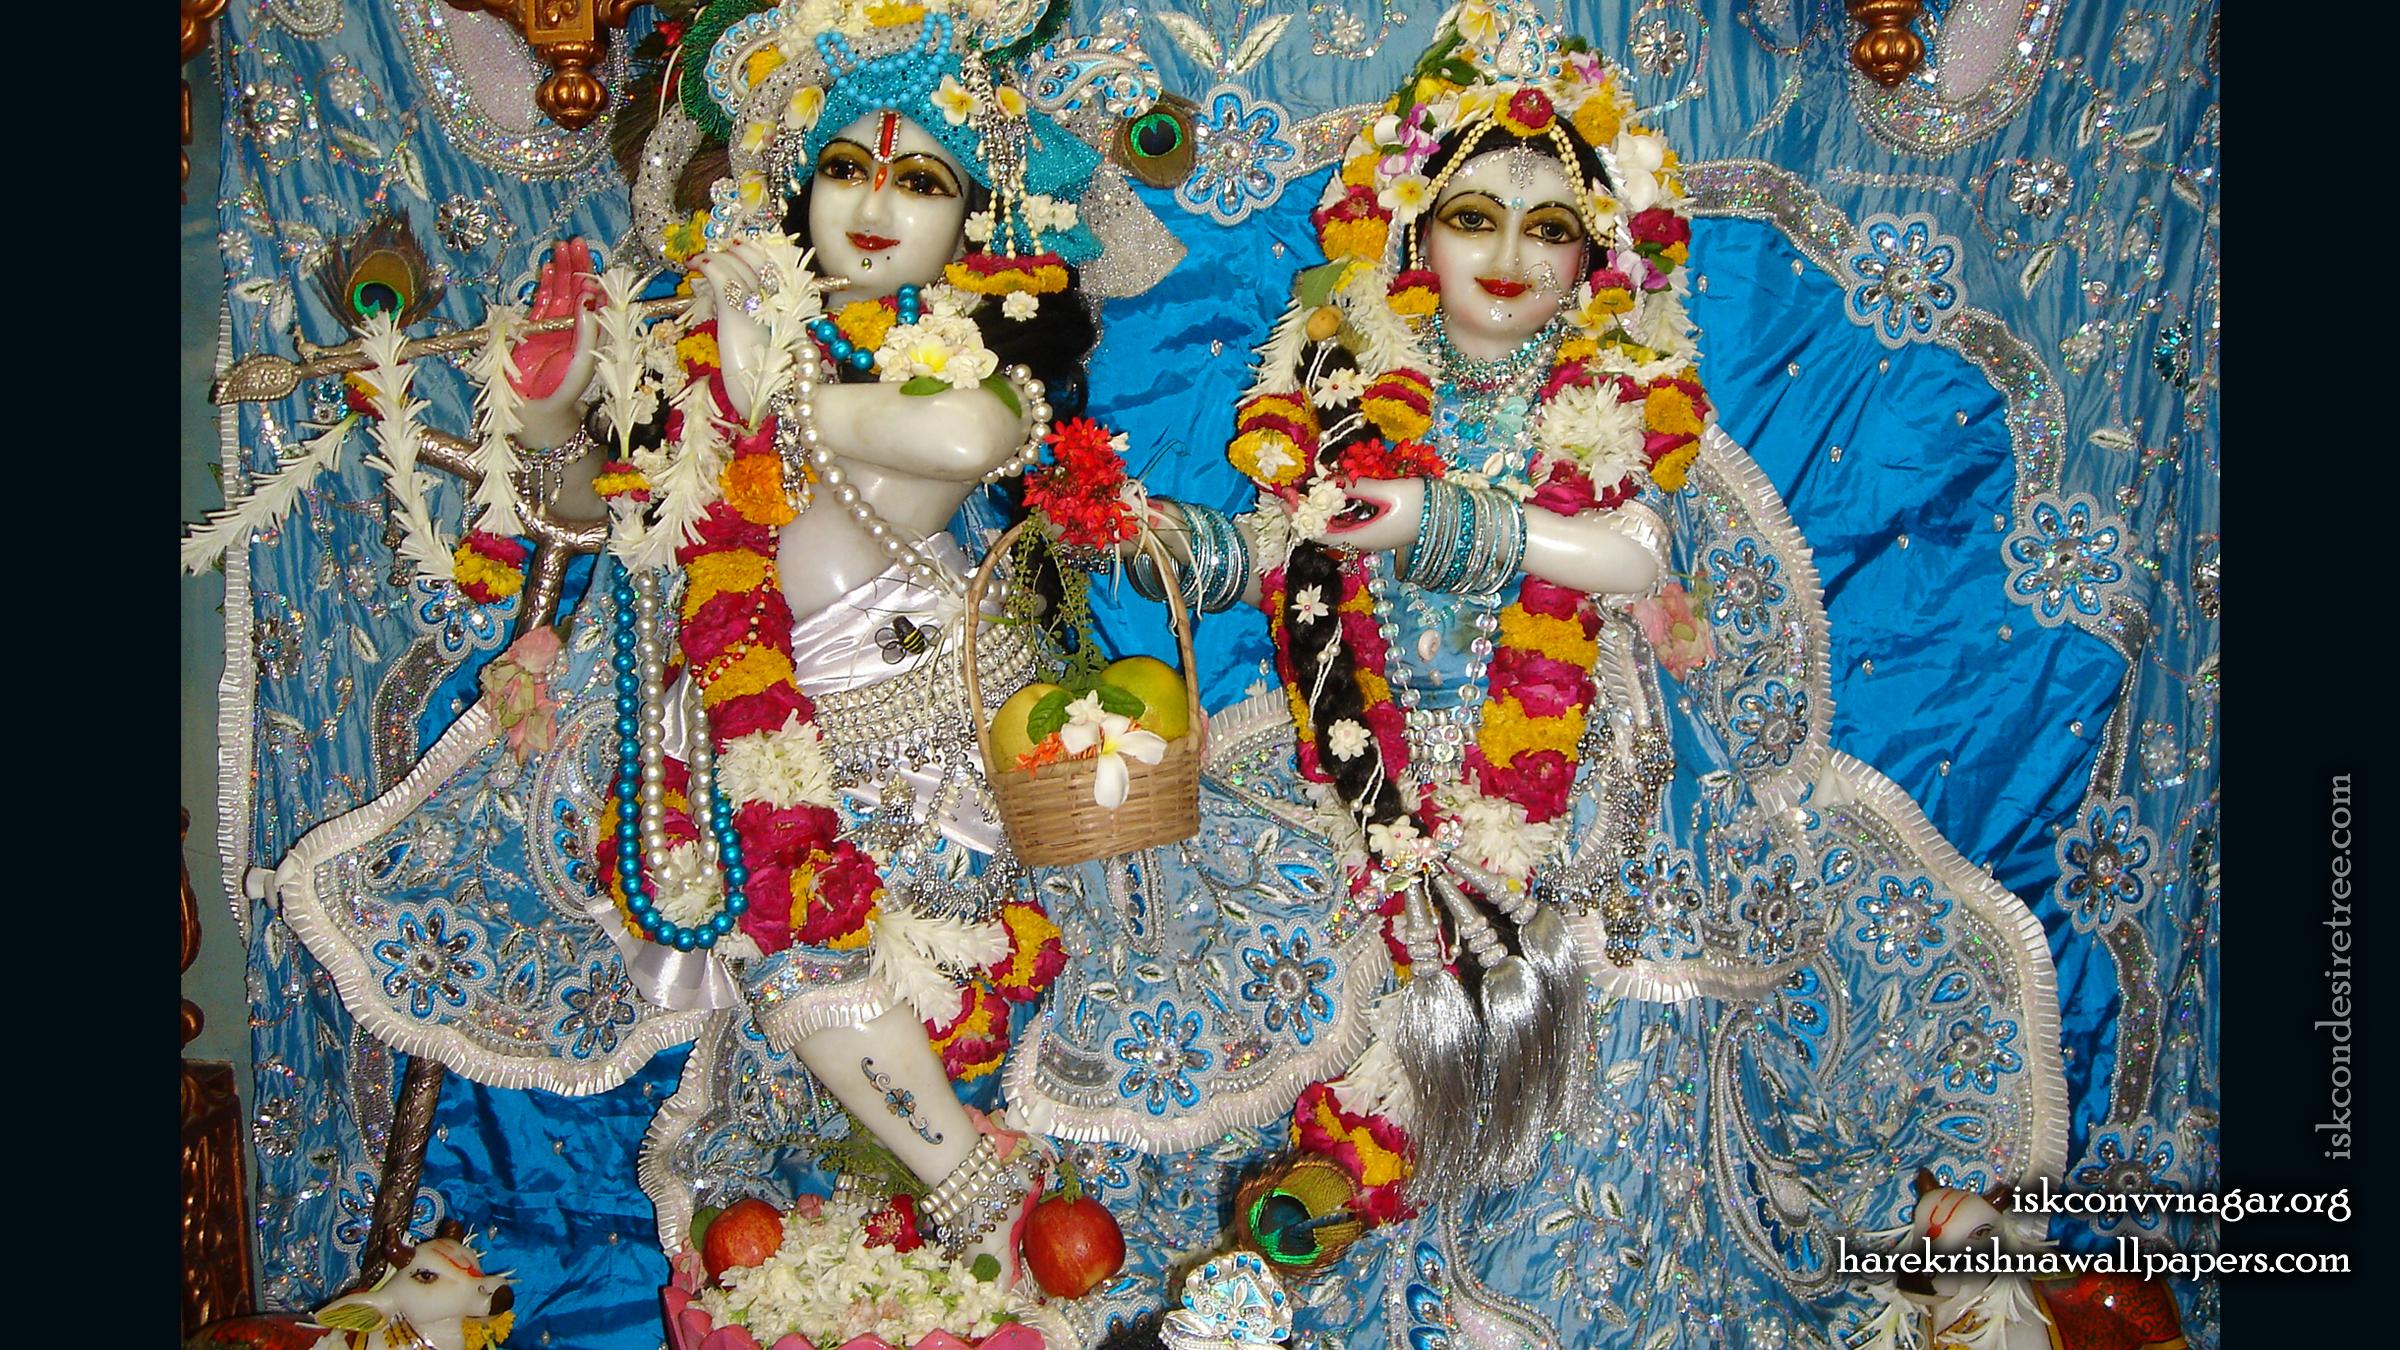 Sri Sri Radha Giridhari Wallpaper (022) Size 2400x1350 Download